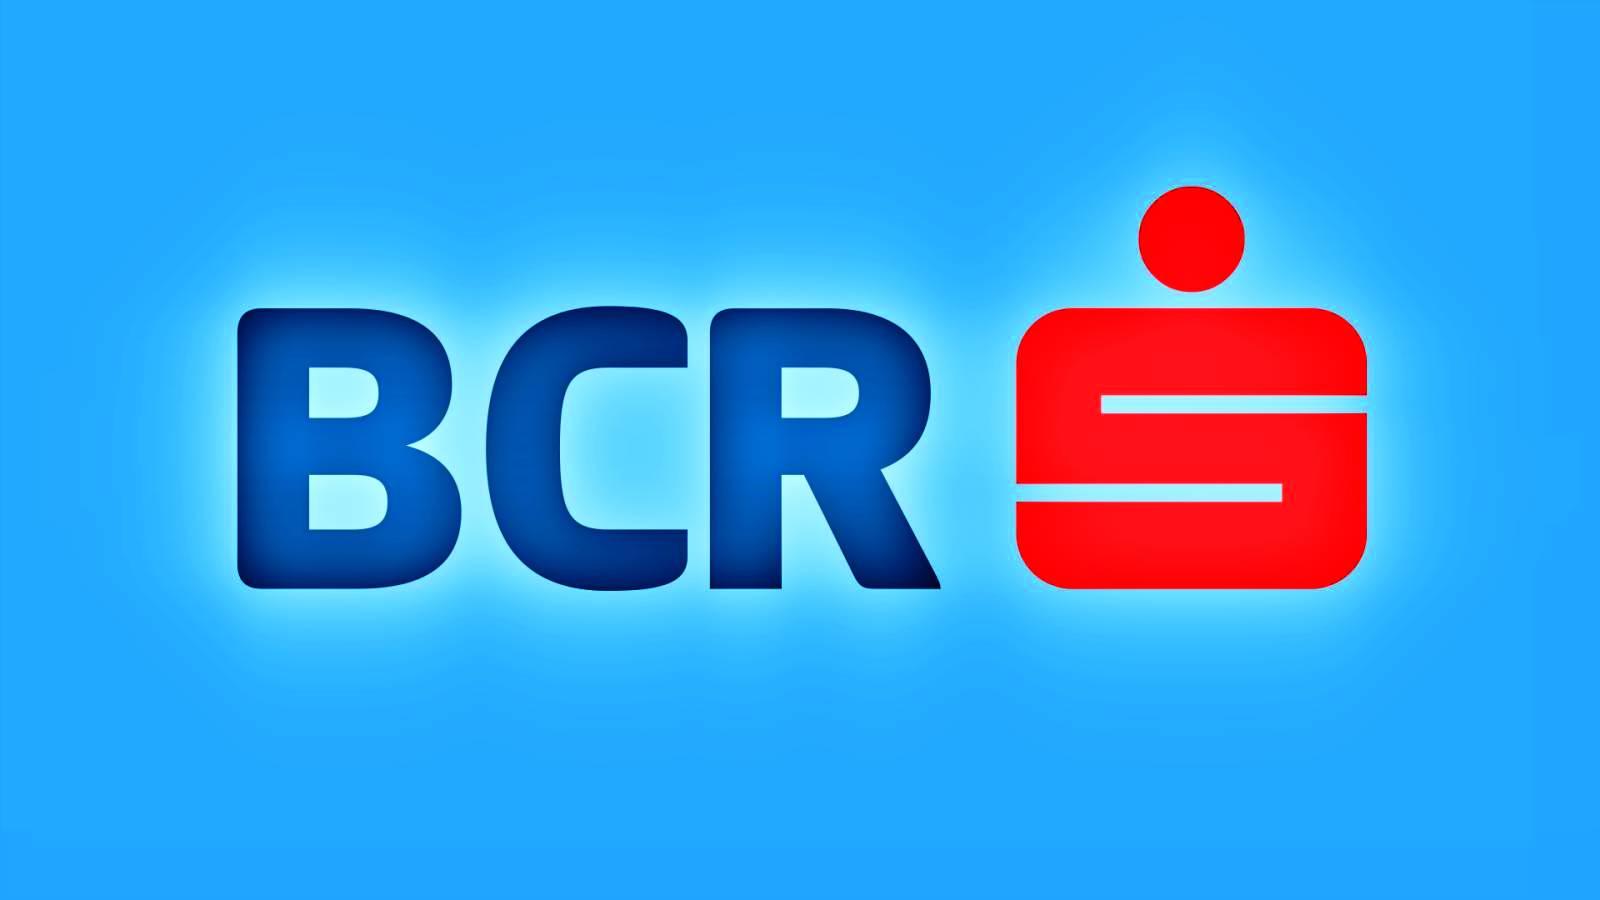 BCR Romania invechit